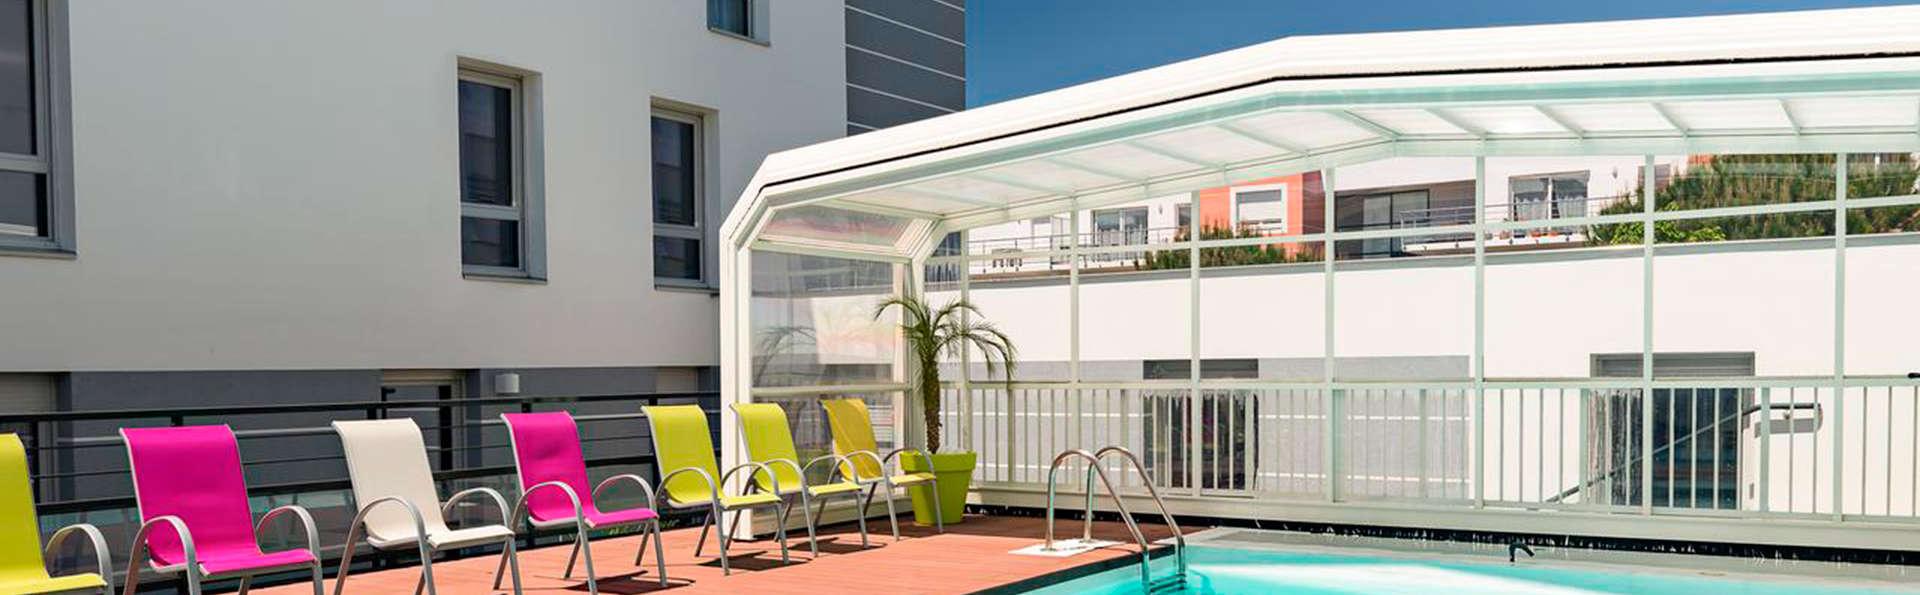 Appart 39 h tel l 39 escale marine charmehotel la rochelle for Appart hotel a poitiers